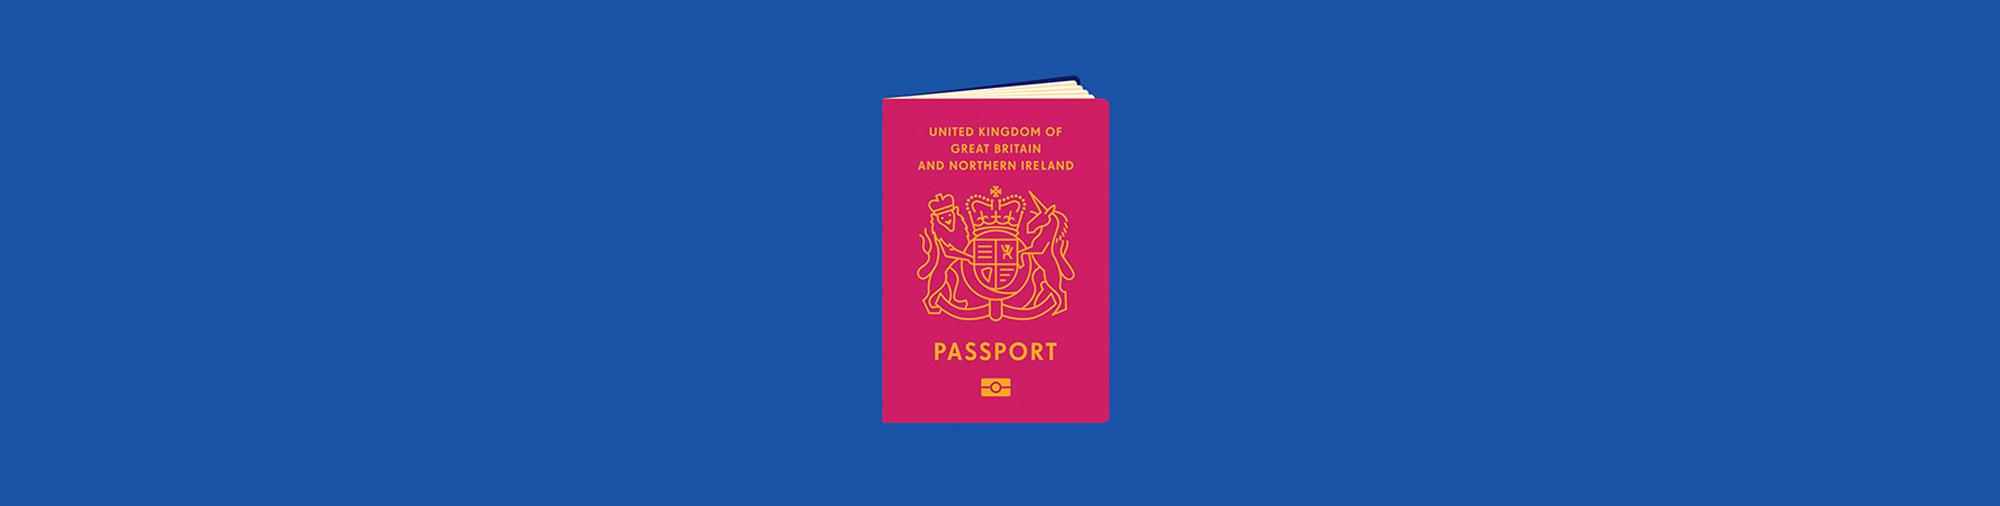 British Citizenship Application: Apply for British Citizenship – Services .